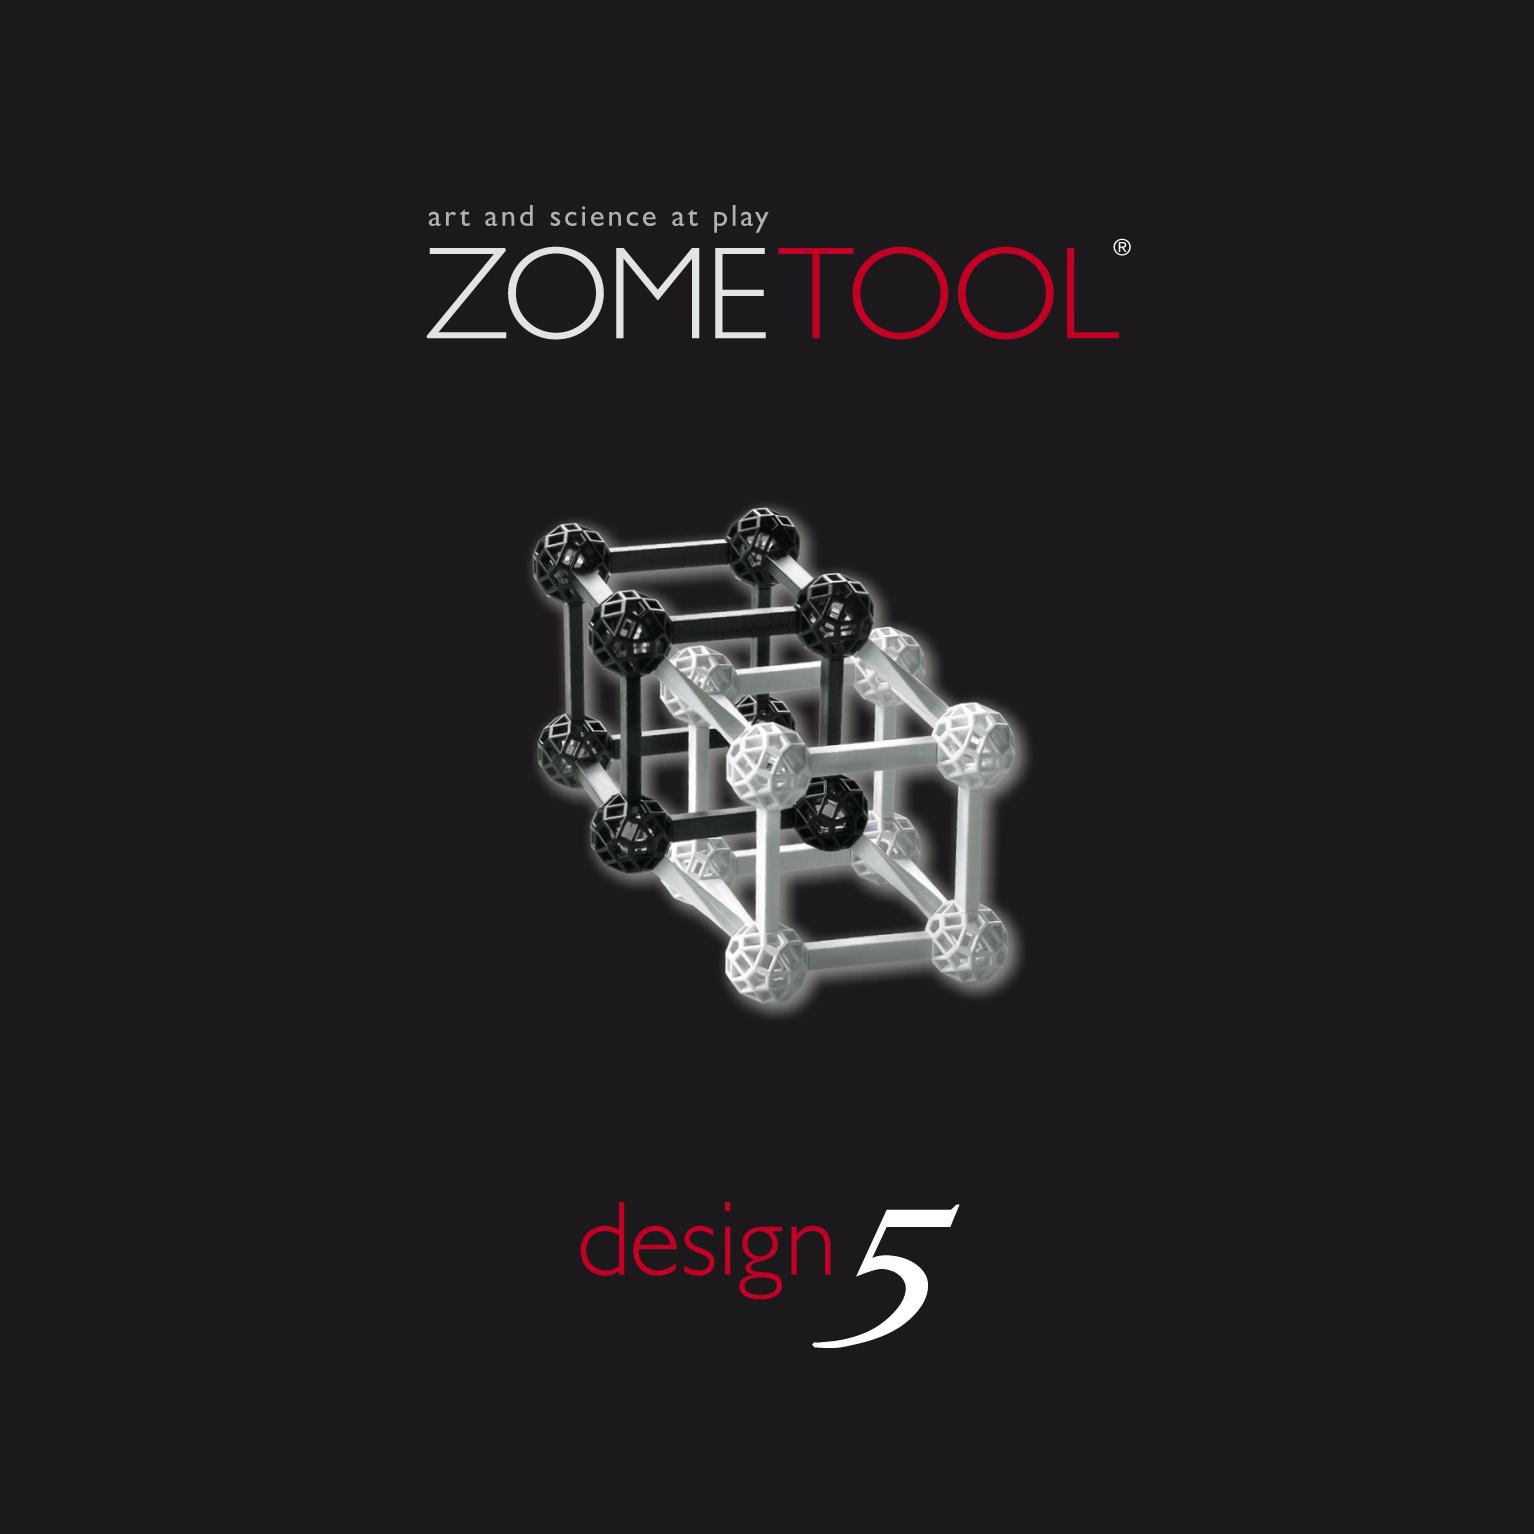 Zometool ConneXions Kugeln Color Konstruktion Kristallgitter Architektur